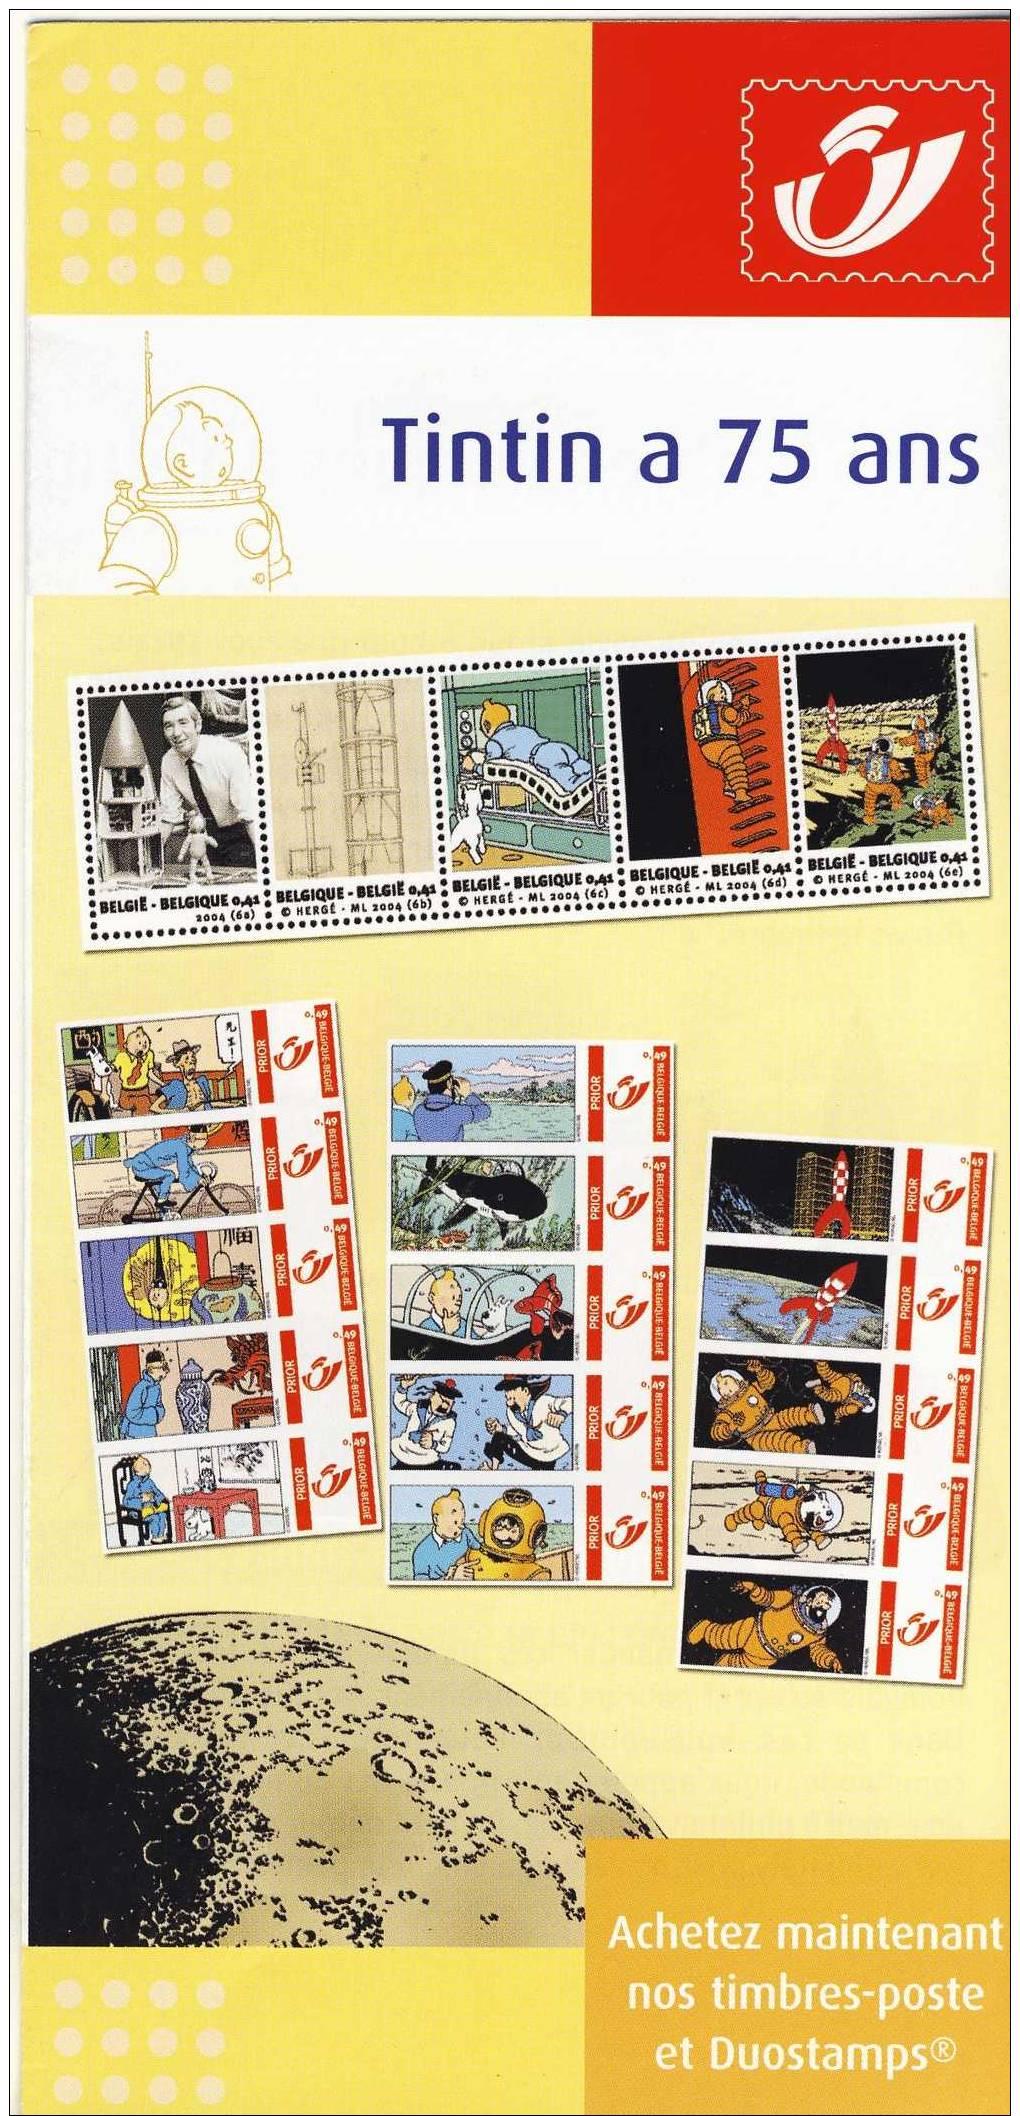 Tintin. Kuifje. La Poste - Advertising